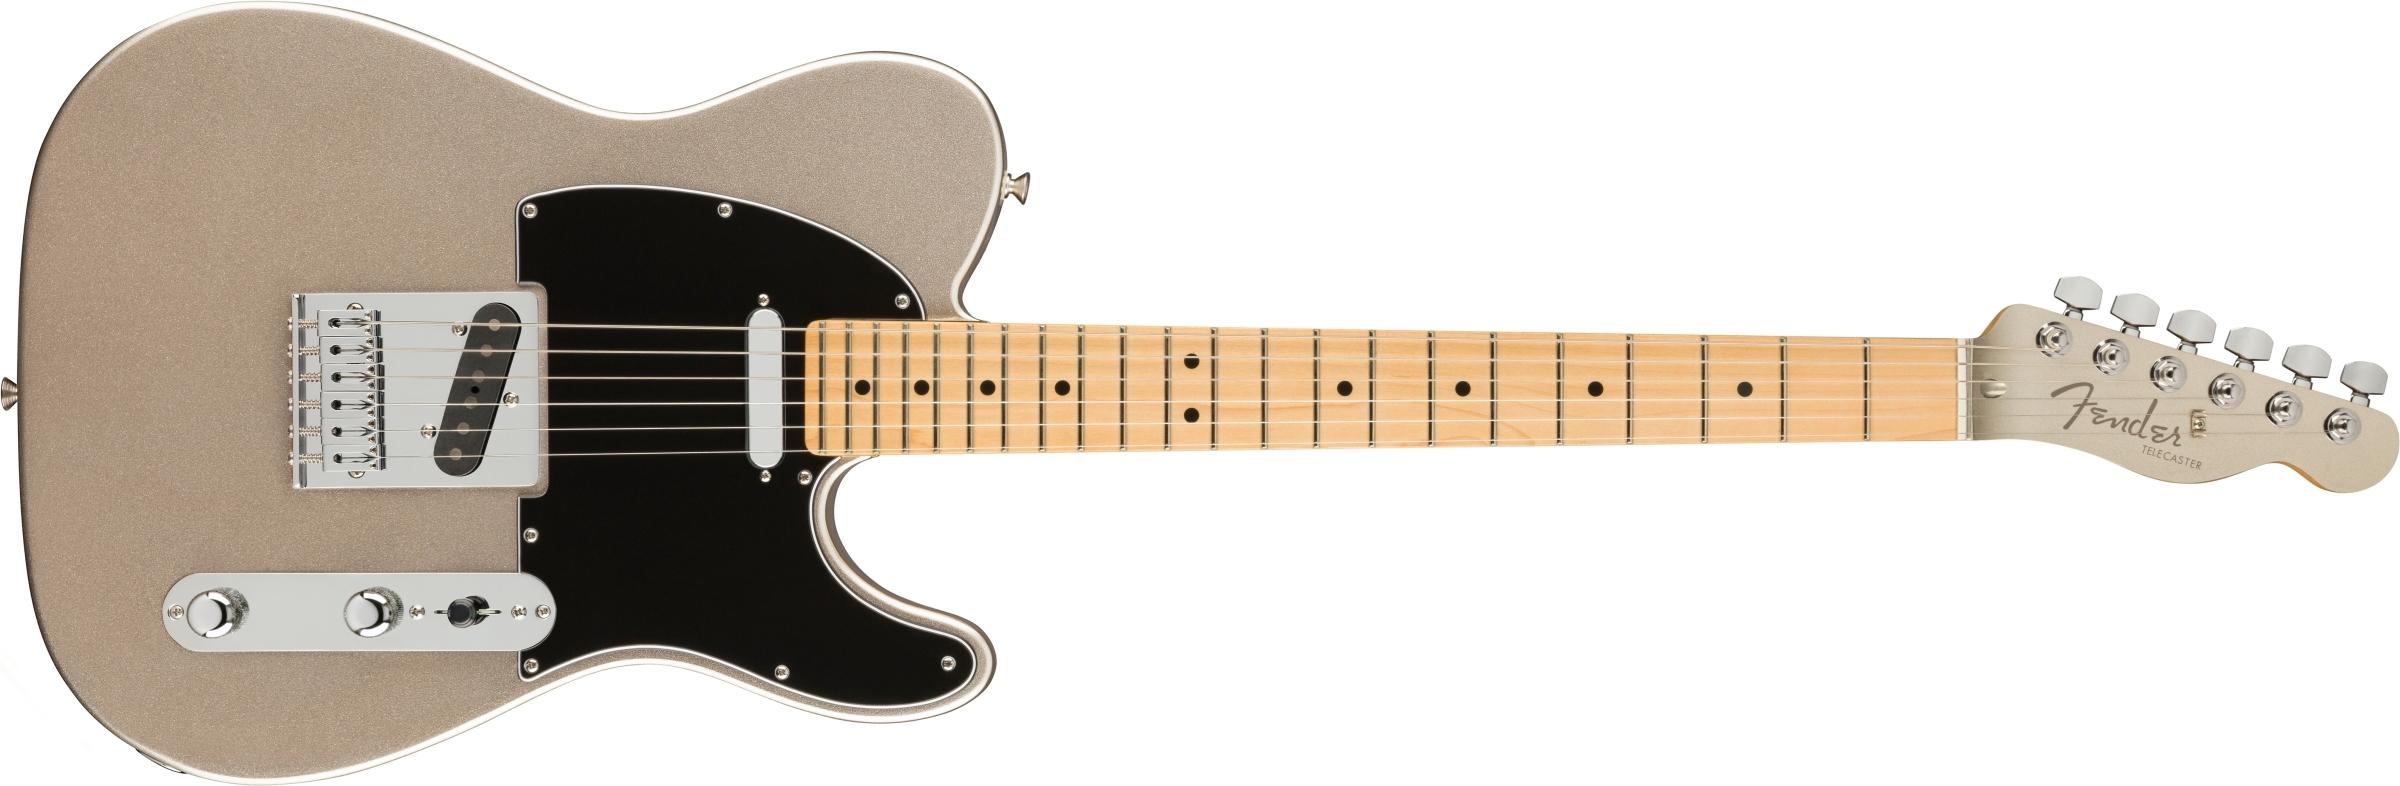 Fender 75th Anniversary Diamond Telecaster